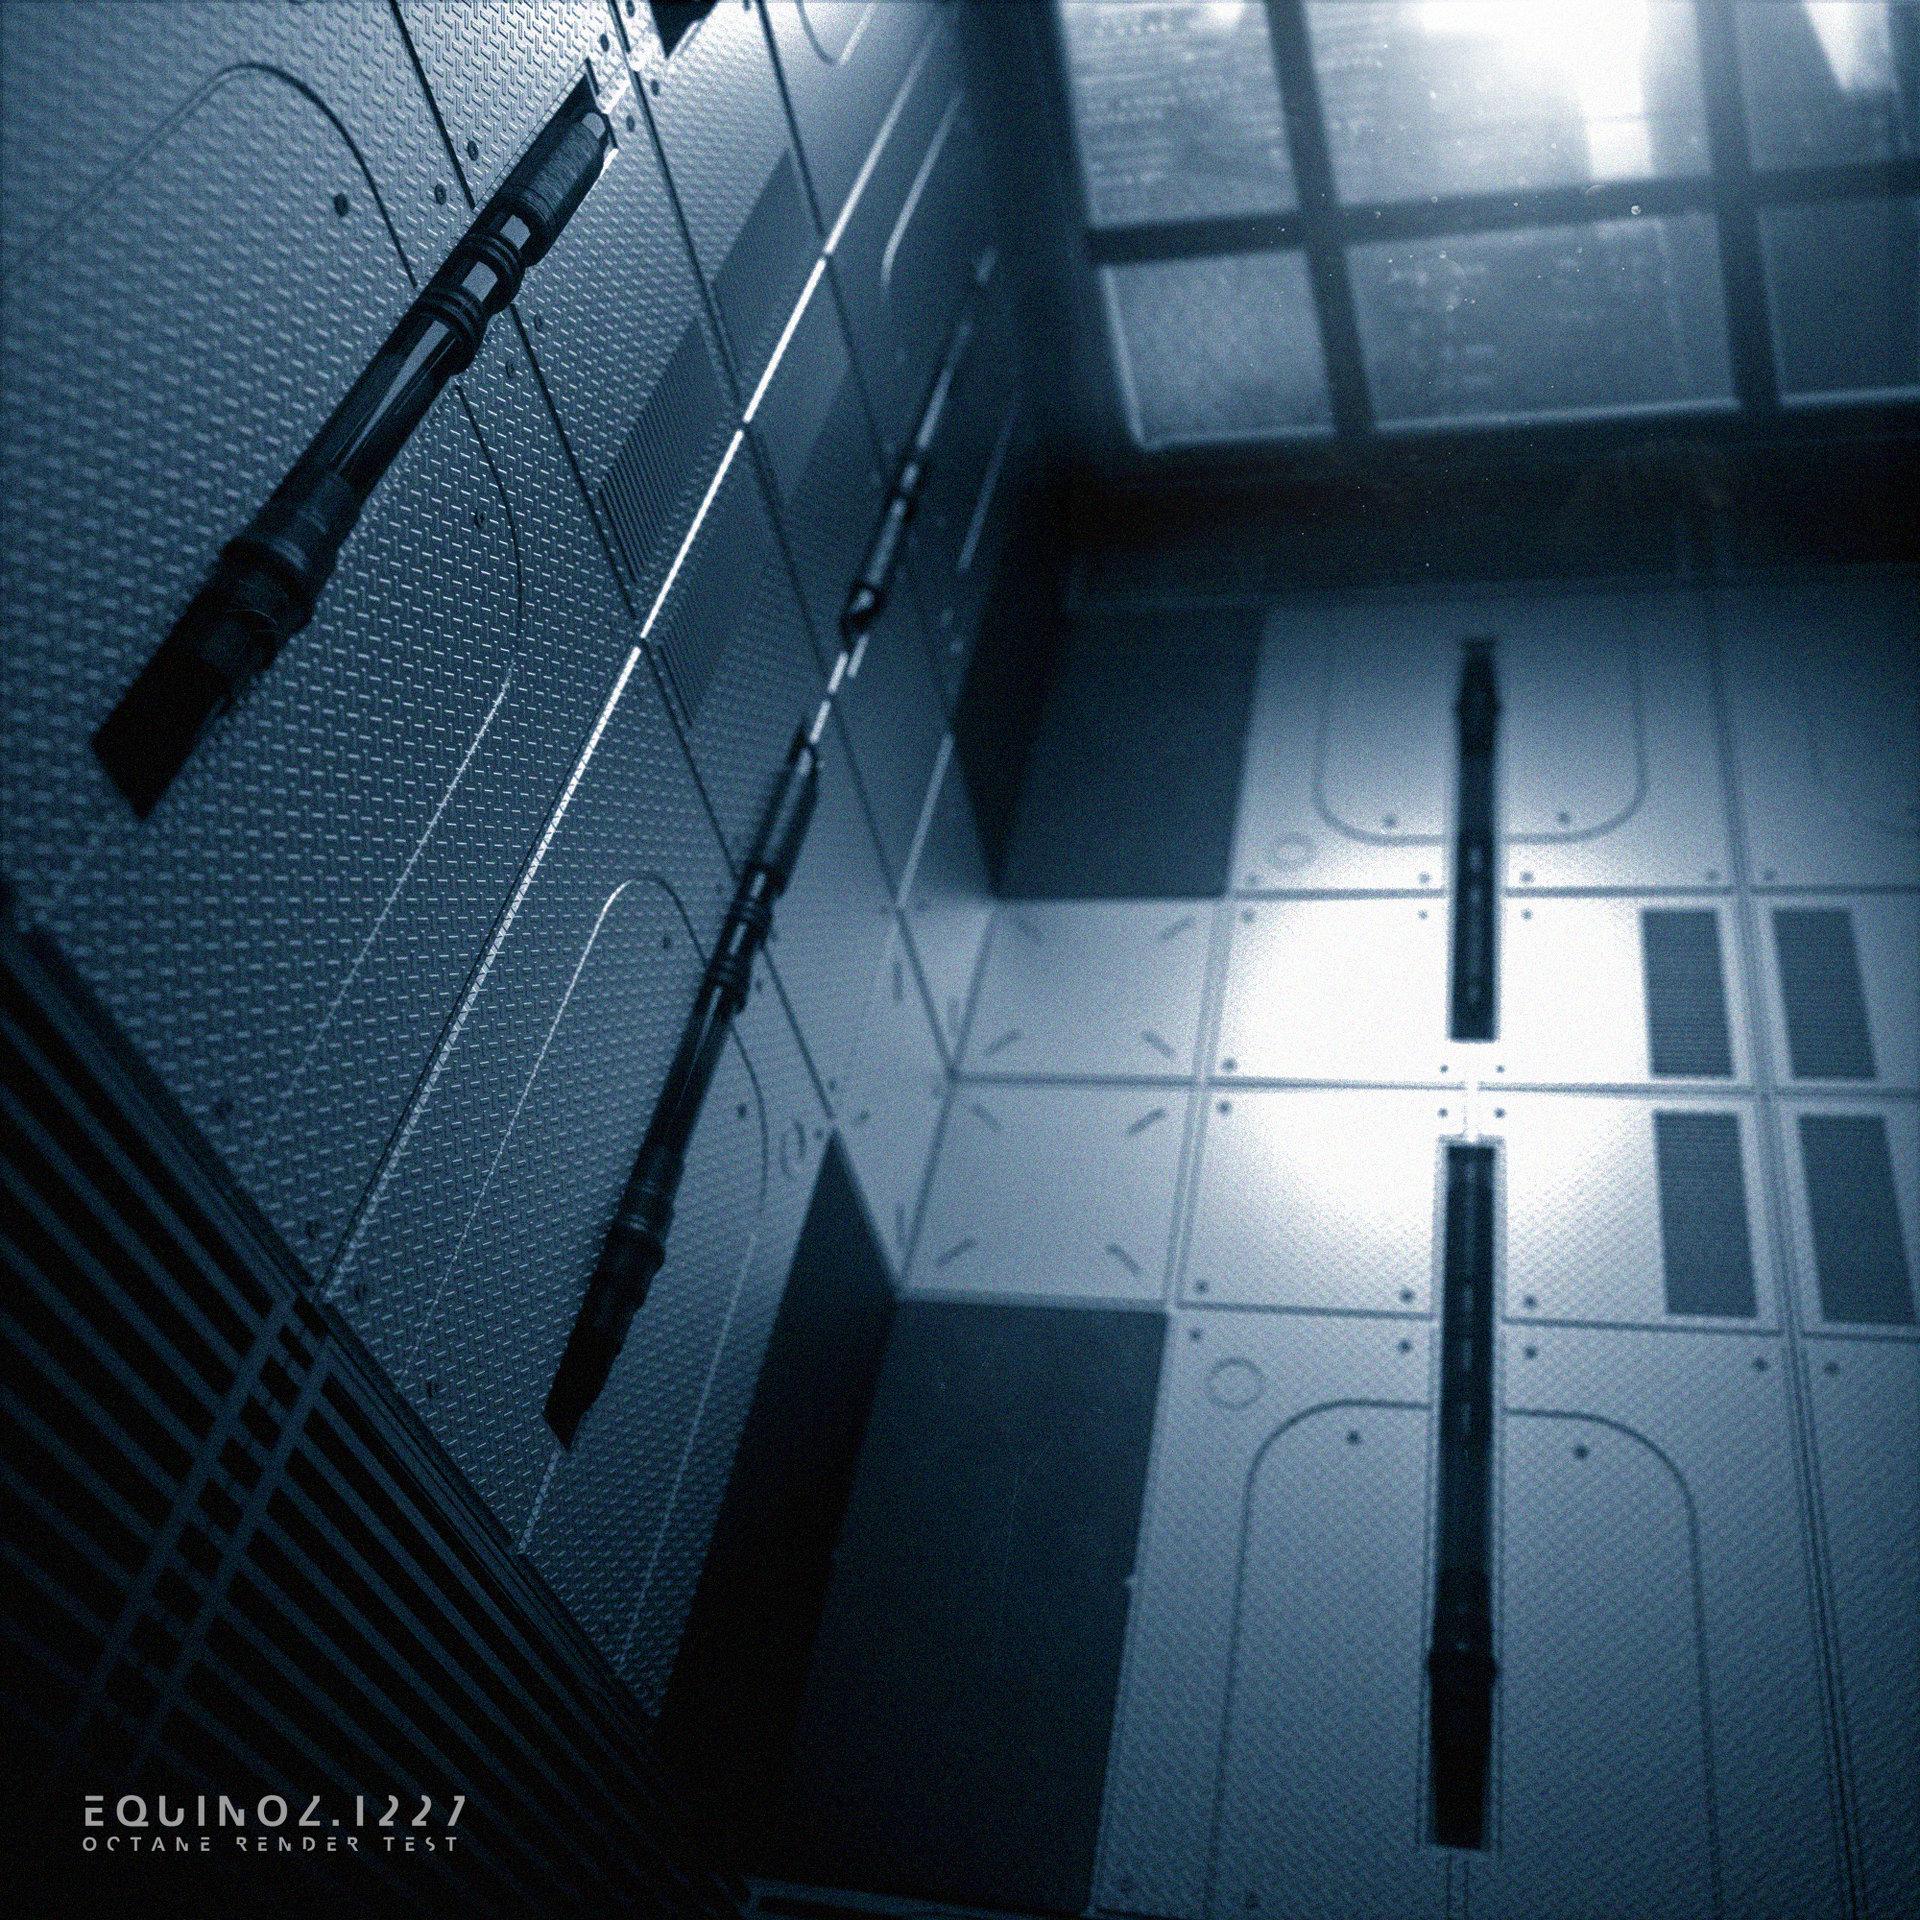 Mark chang elevator